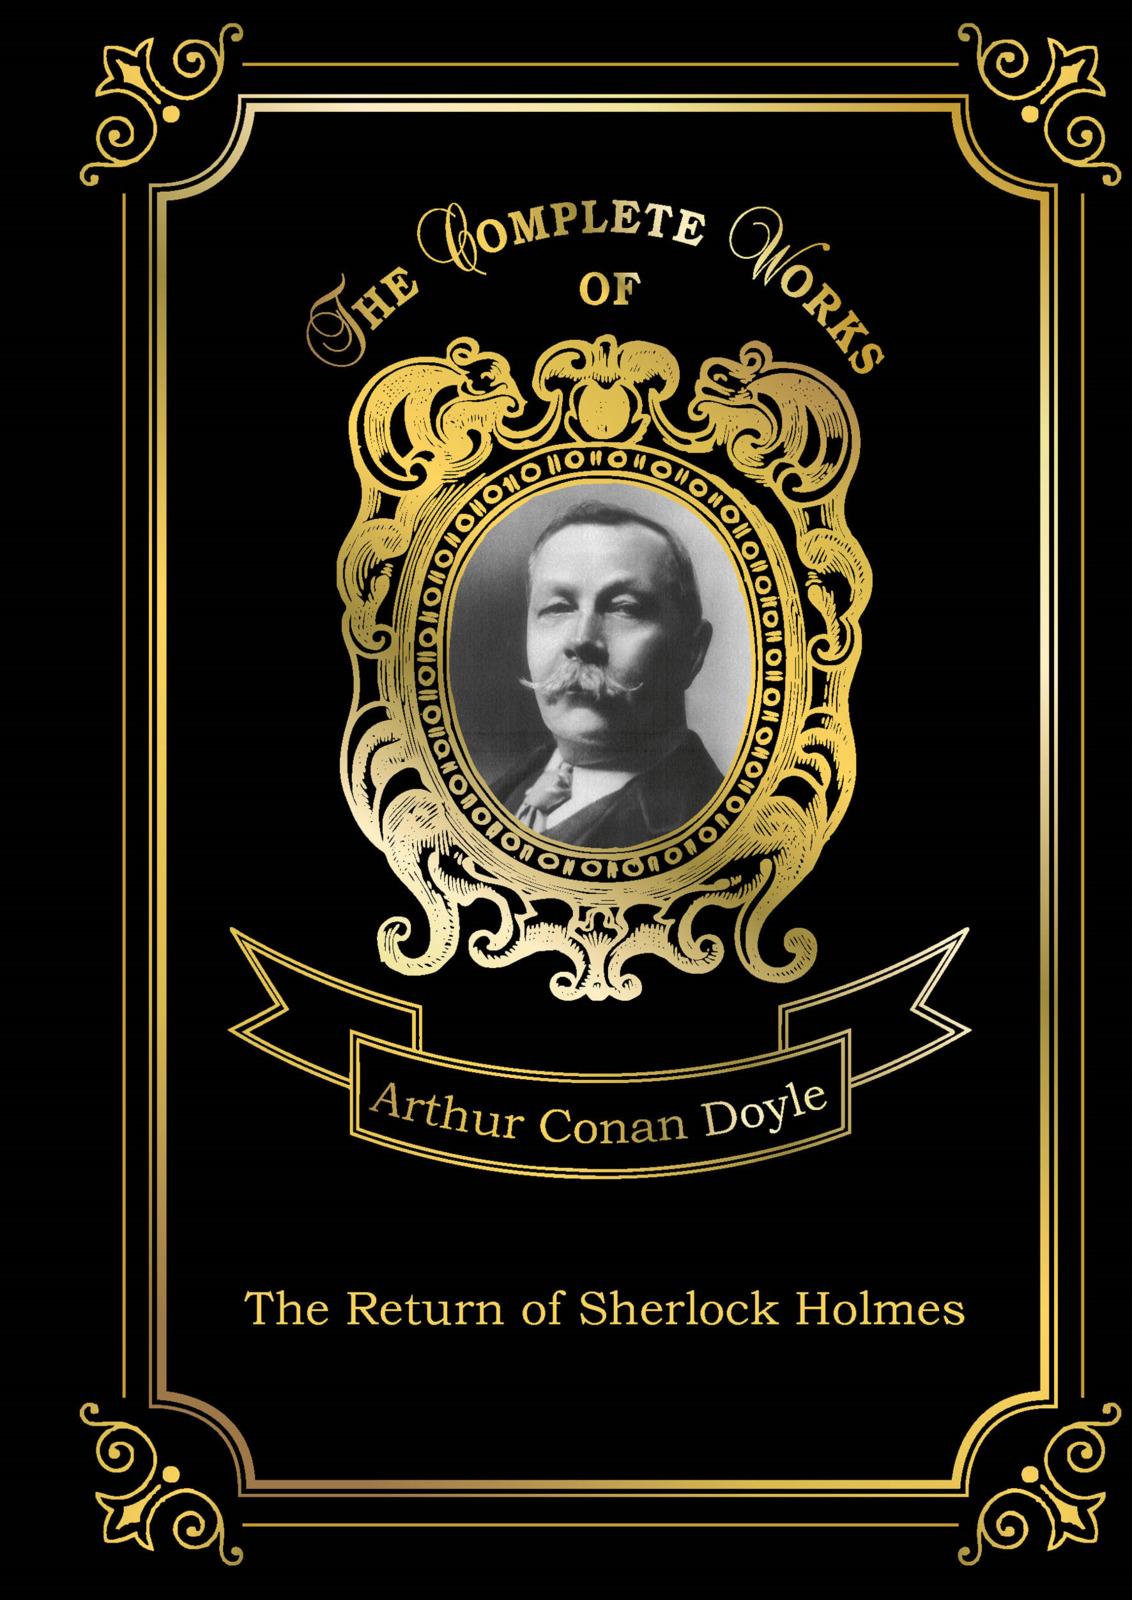 A. C. Doyle The Return of Sherlock Holmes